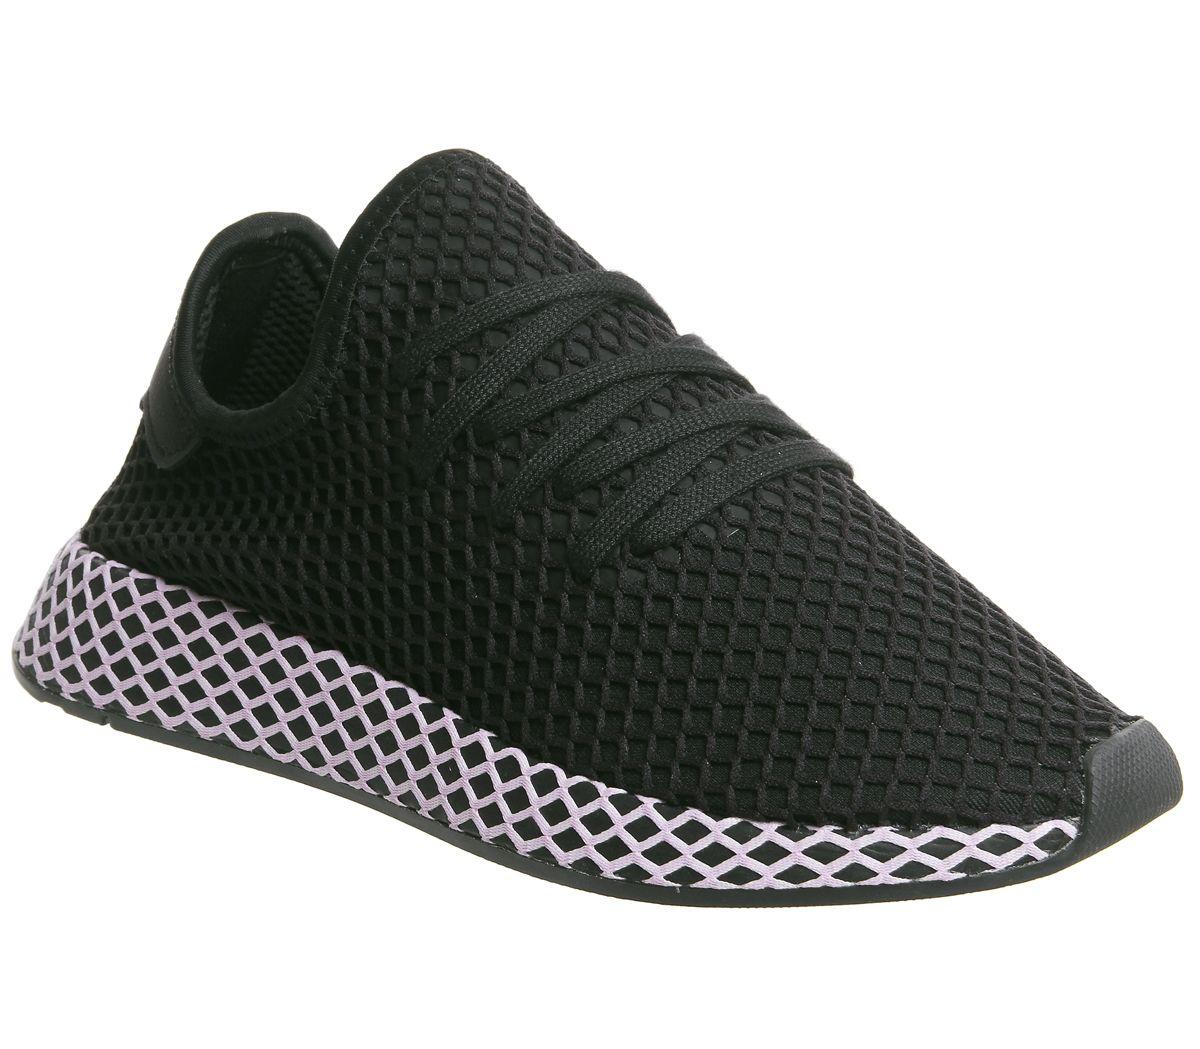 0b377b76d4db7 adidas Deerupt Trainers Core Black Clear Lilac F - Hers trainers